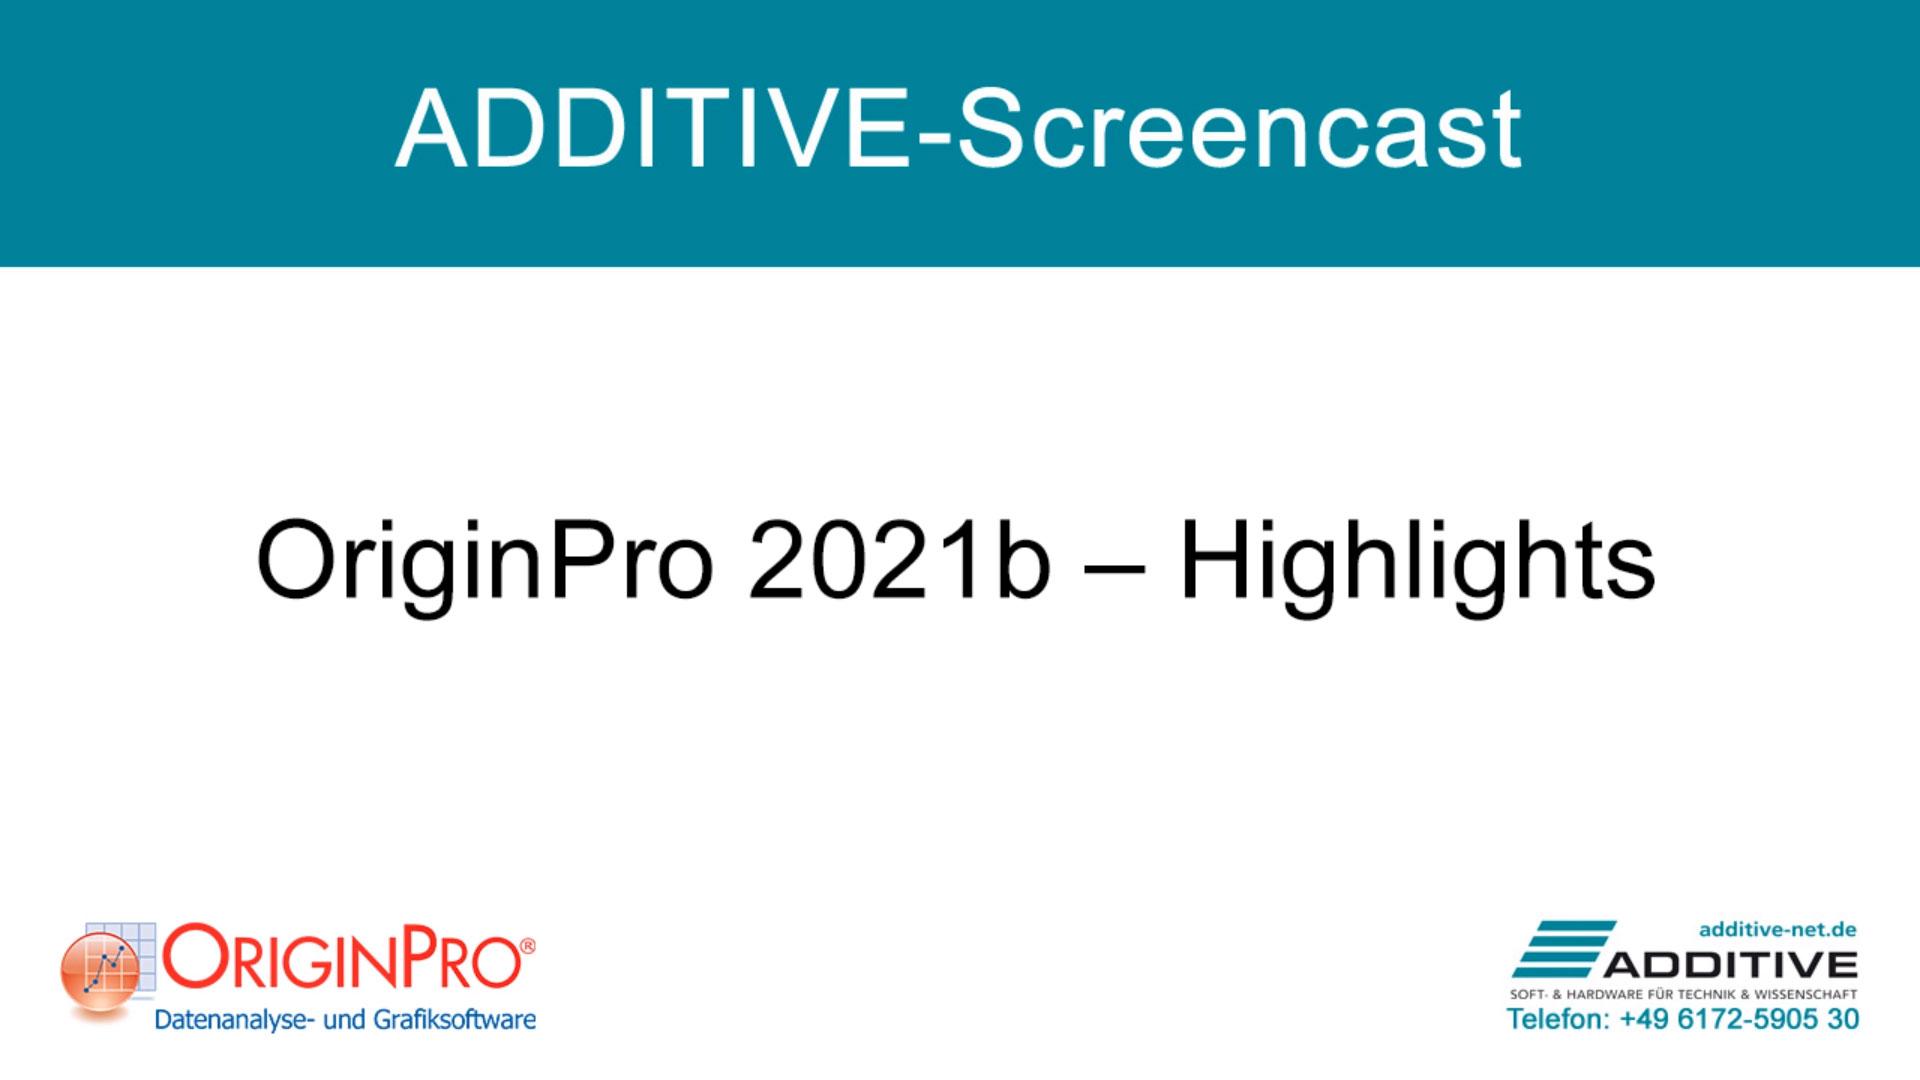 Highlights in OriginPro 2021b